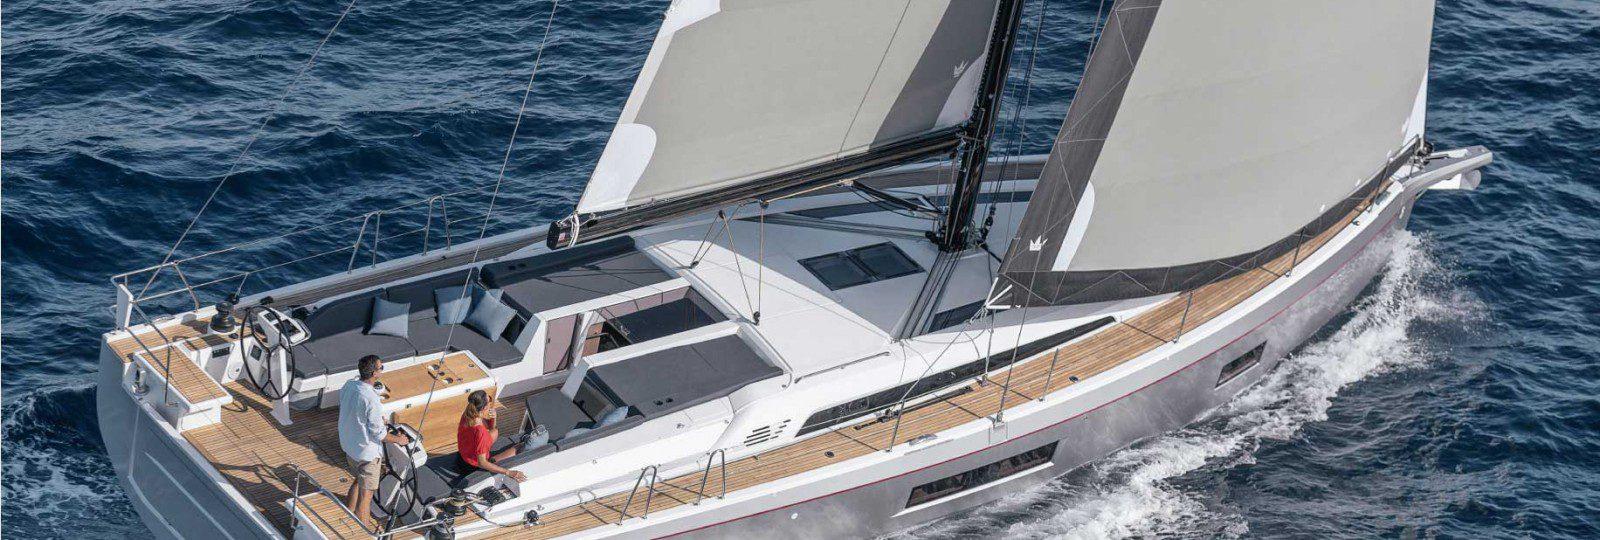 Beneteau Oceanis 51.1 running